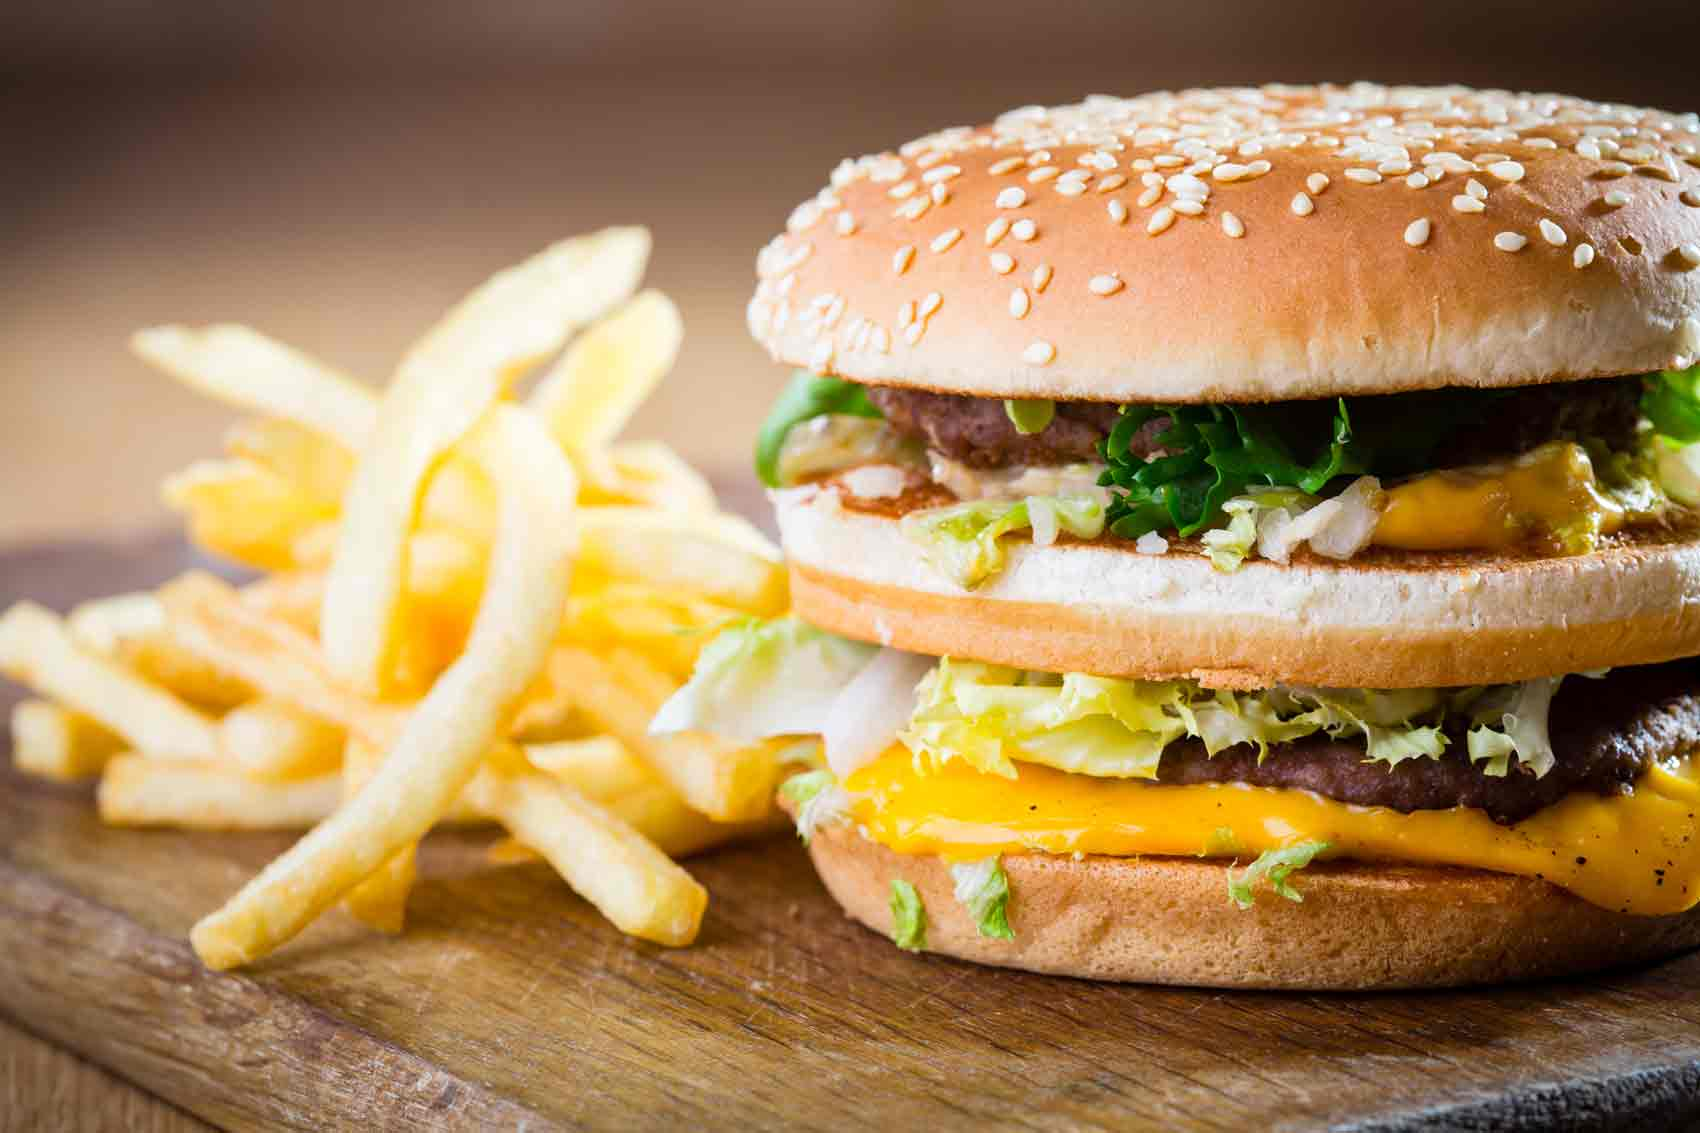 The Fast Food Phthalates Chemical Fiasco